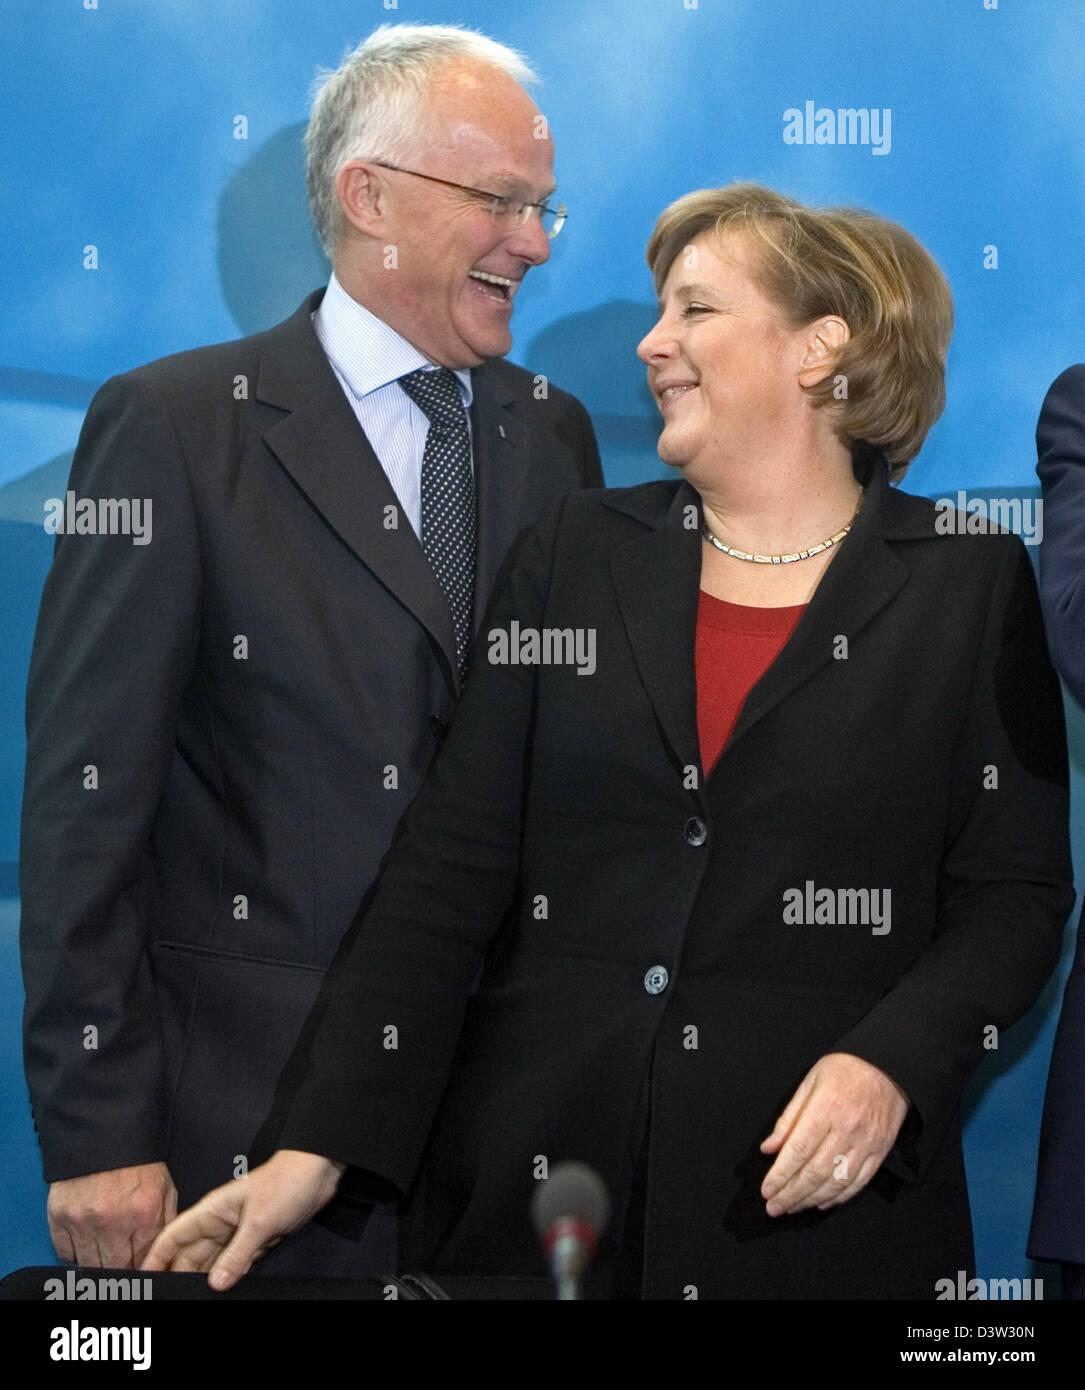 German Chancellor Angela Merkel (R) talks to North Rhine Westphalia's Prime Minister Juergen Ruettgers prior - Stock Image